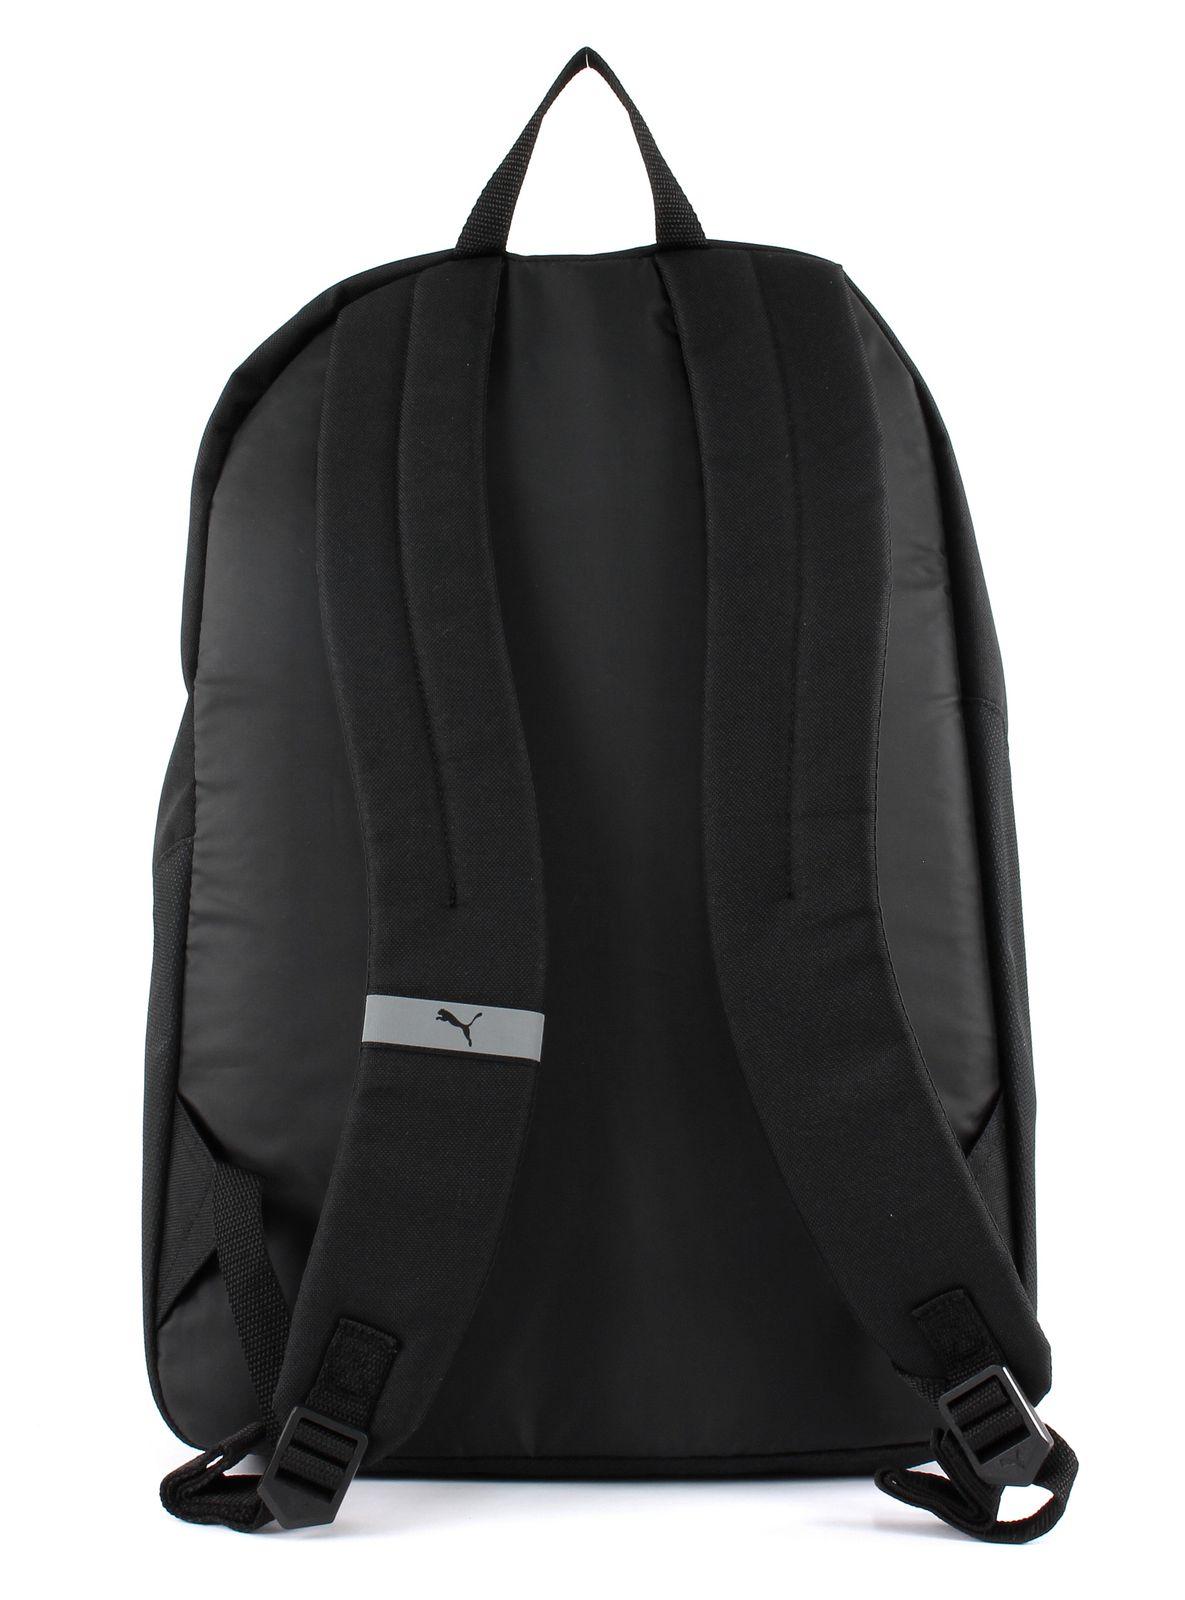 a0f51a923a291 ... ÜberweisungTap To ClosePUMA Pioneer Backpack Puma BlackTap To CloseNur  möglich bei sofortigem Zahlungseingang mit Paypal